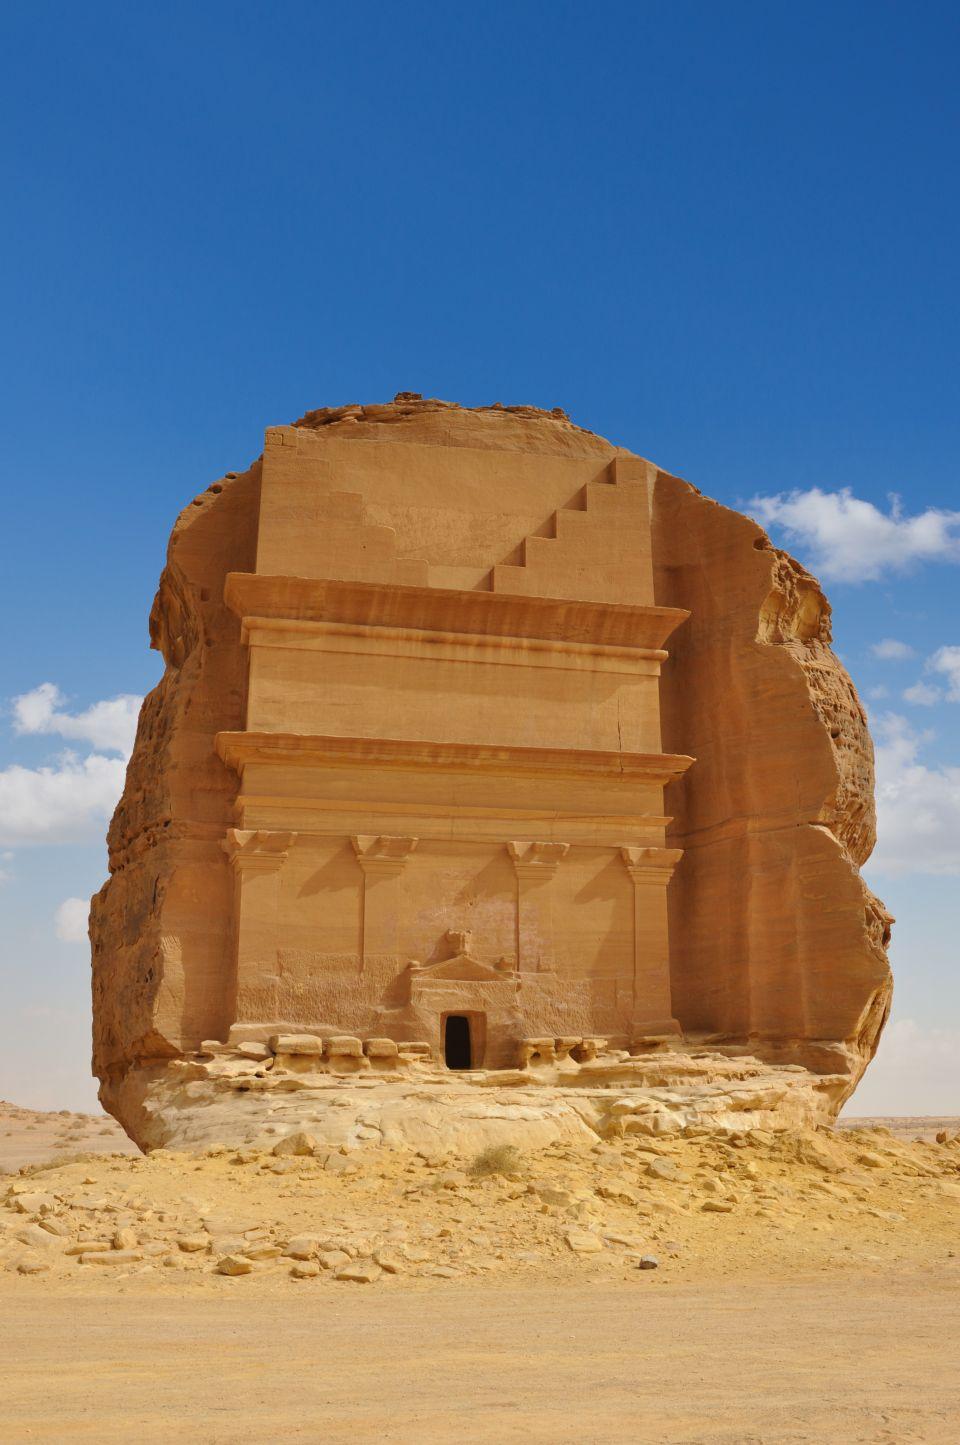 Qasr Al Farid - Arabia Saudita